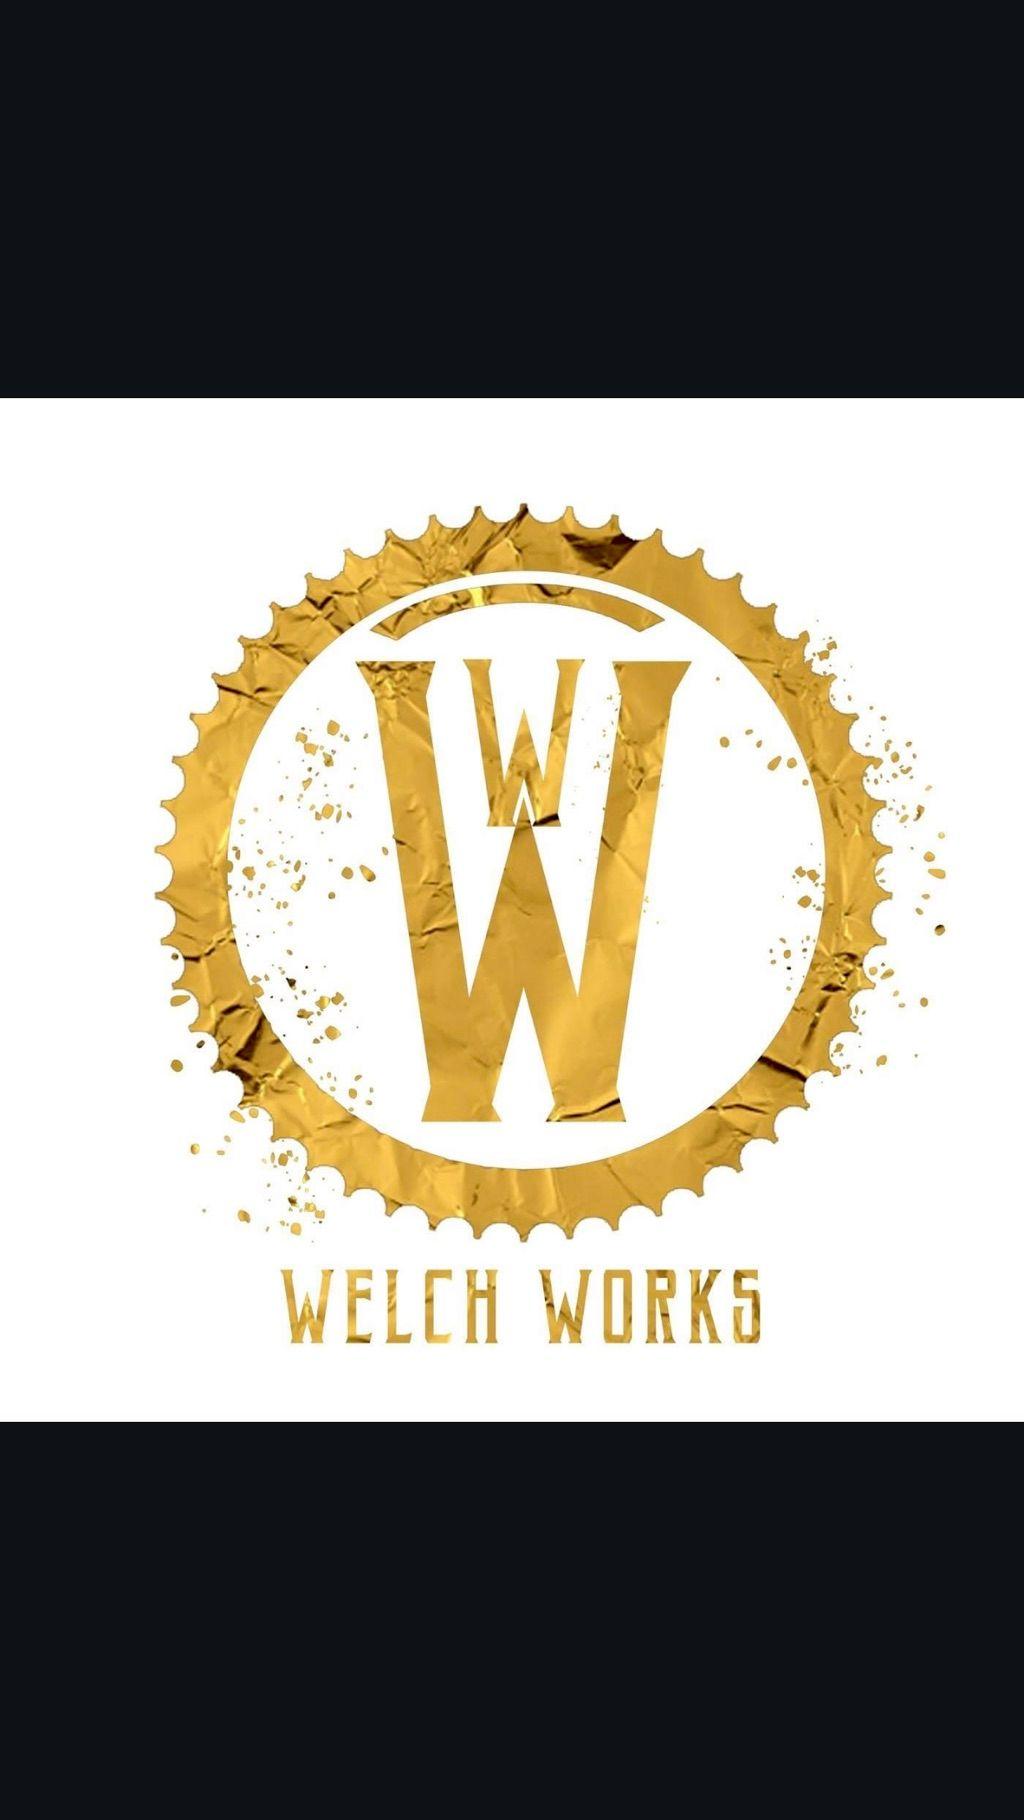 Welch Works Services